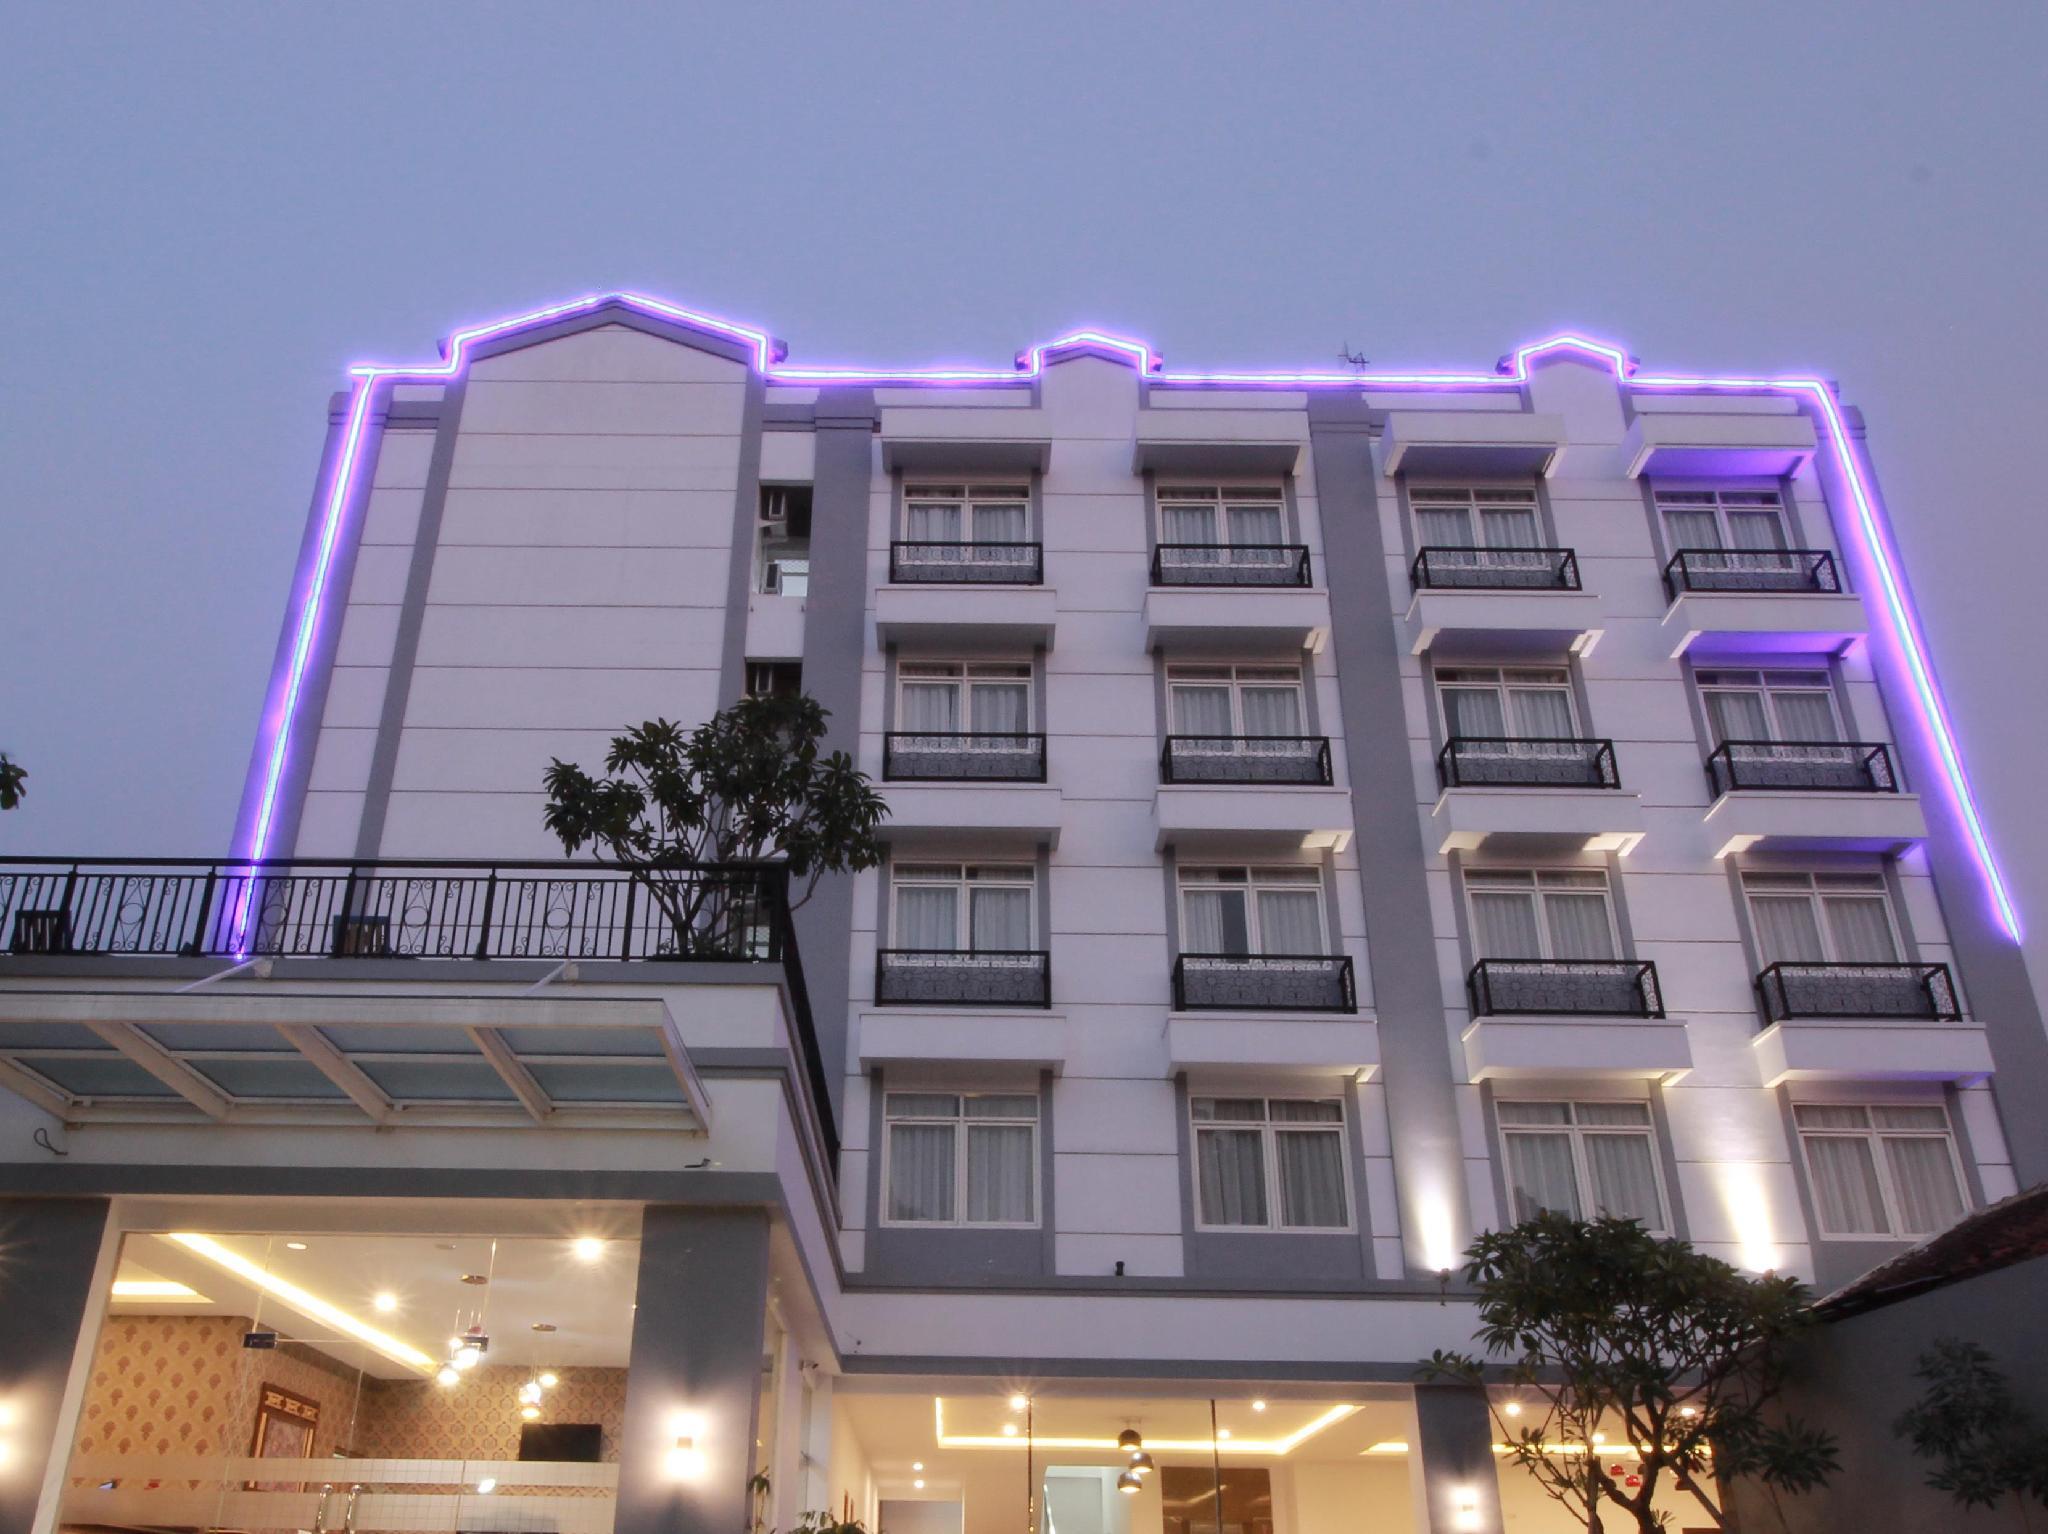 summer quest hotel jogja leancy travel rh leancytravel co